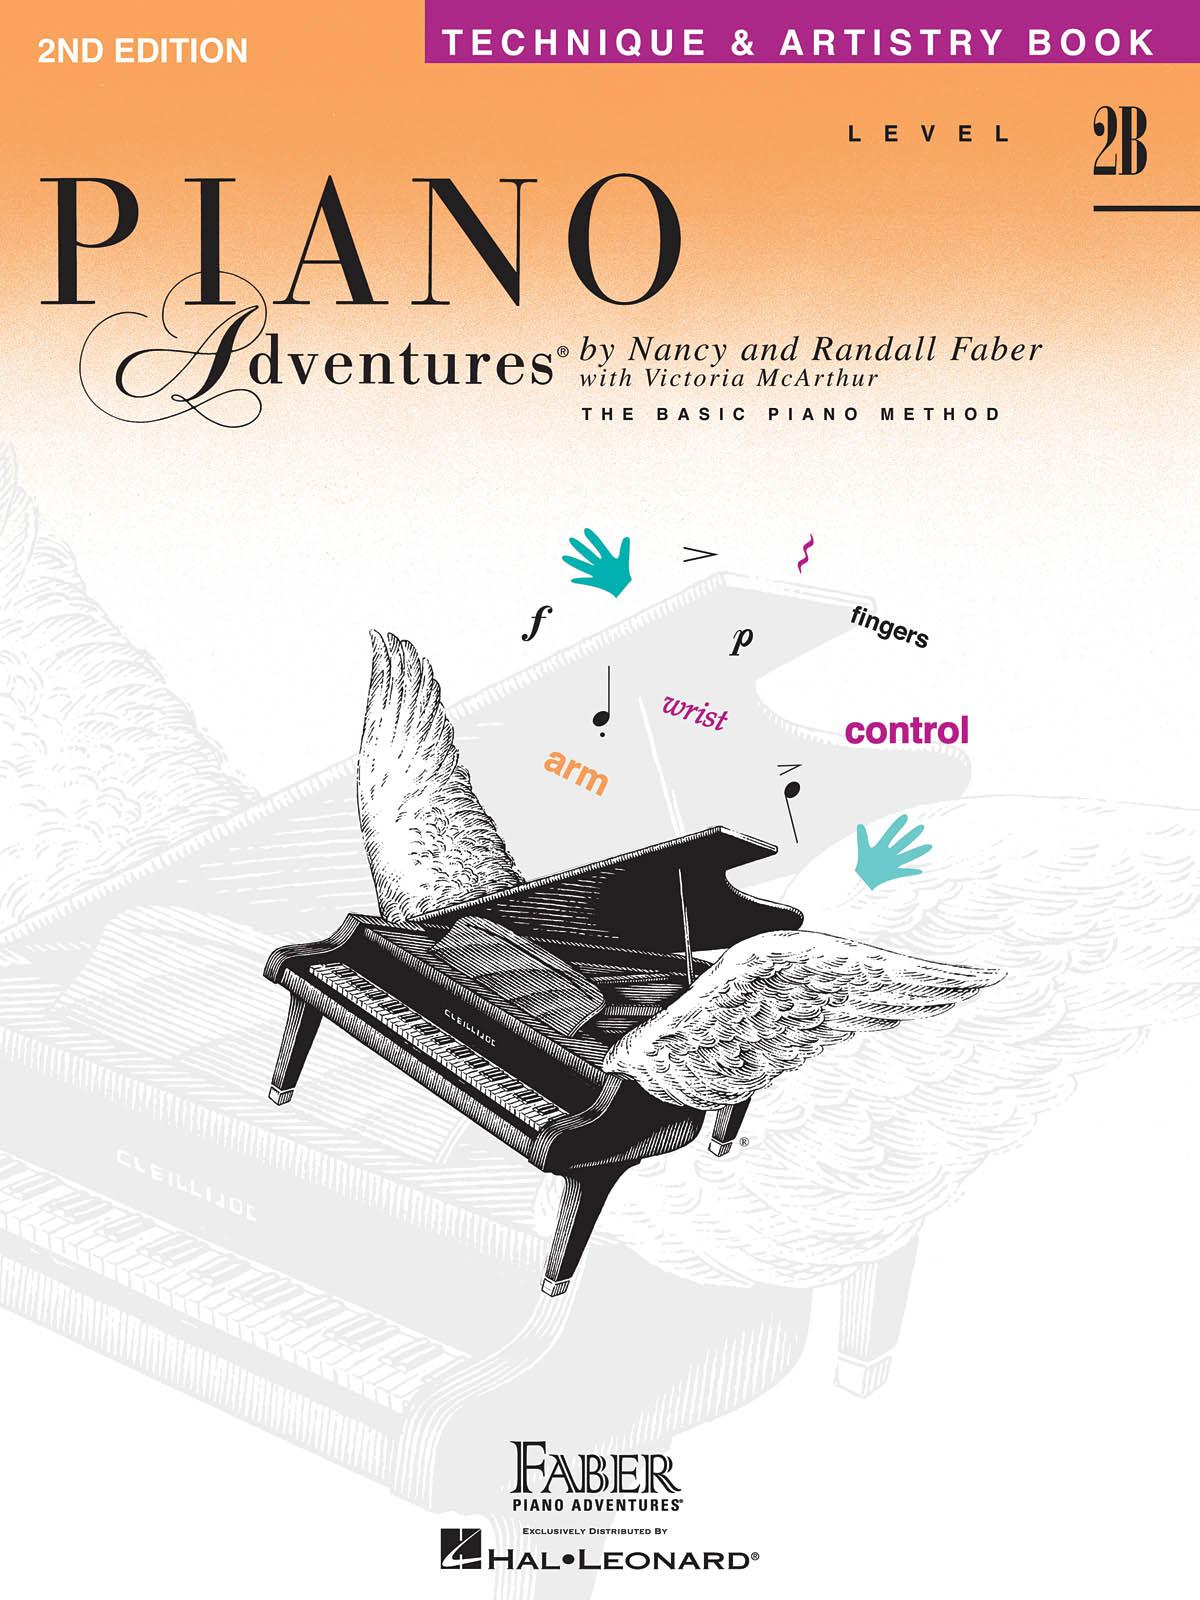 Faber Piano Adventures, Technique & Artistry Book, Level 2B